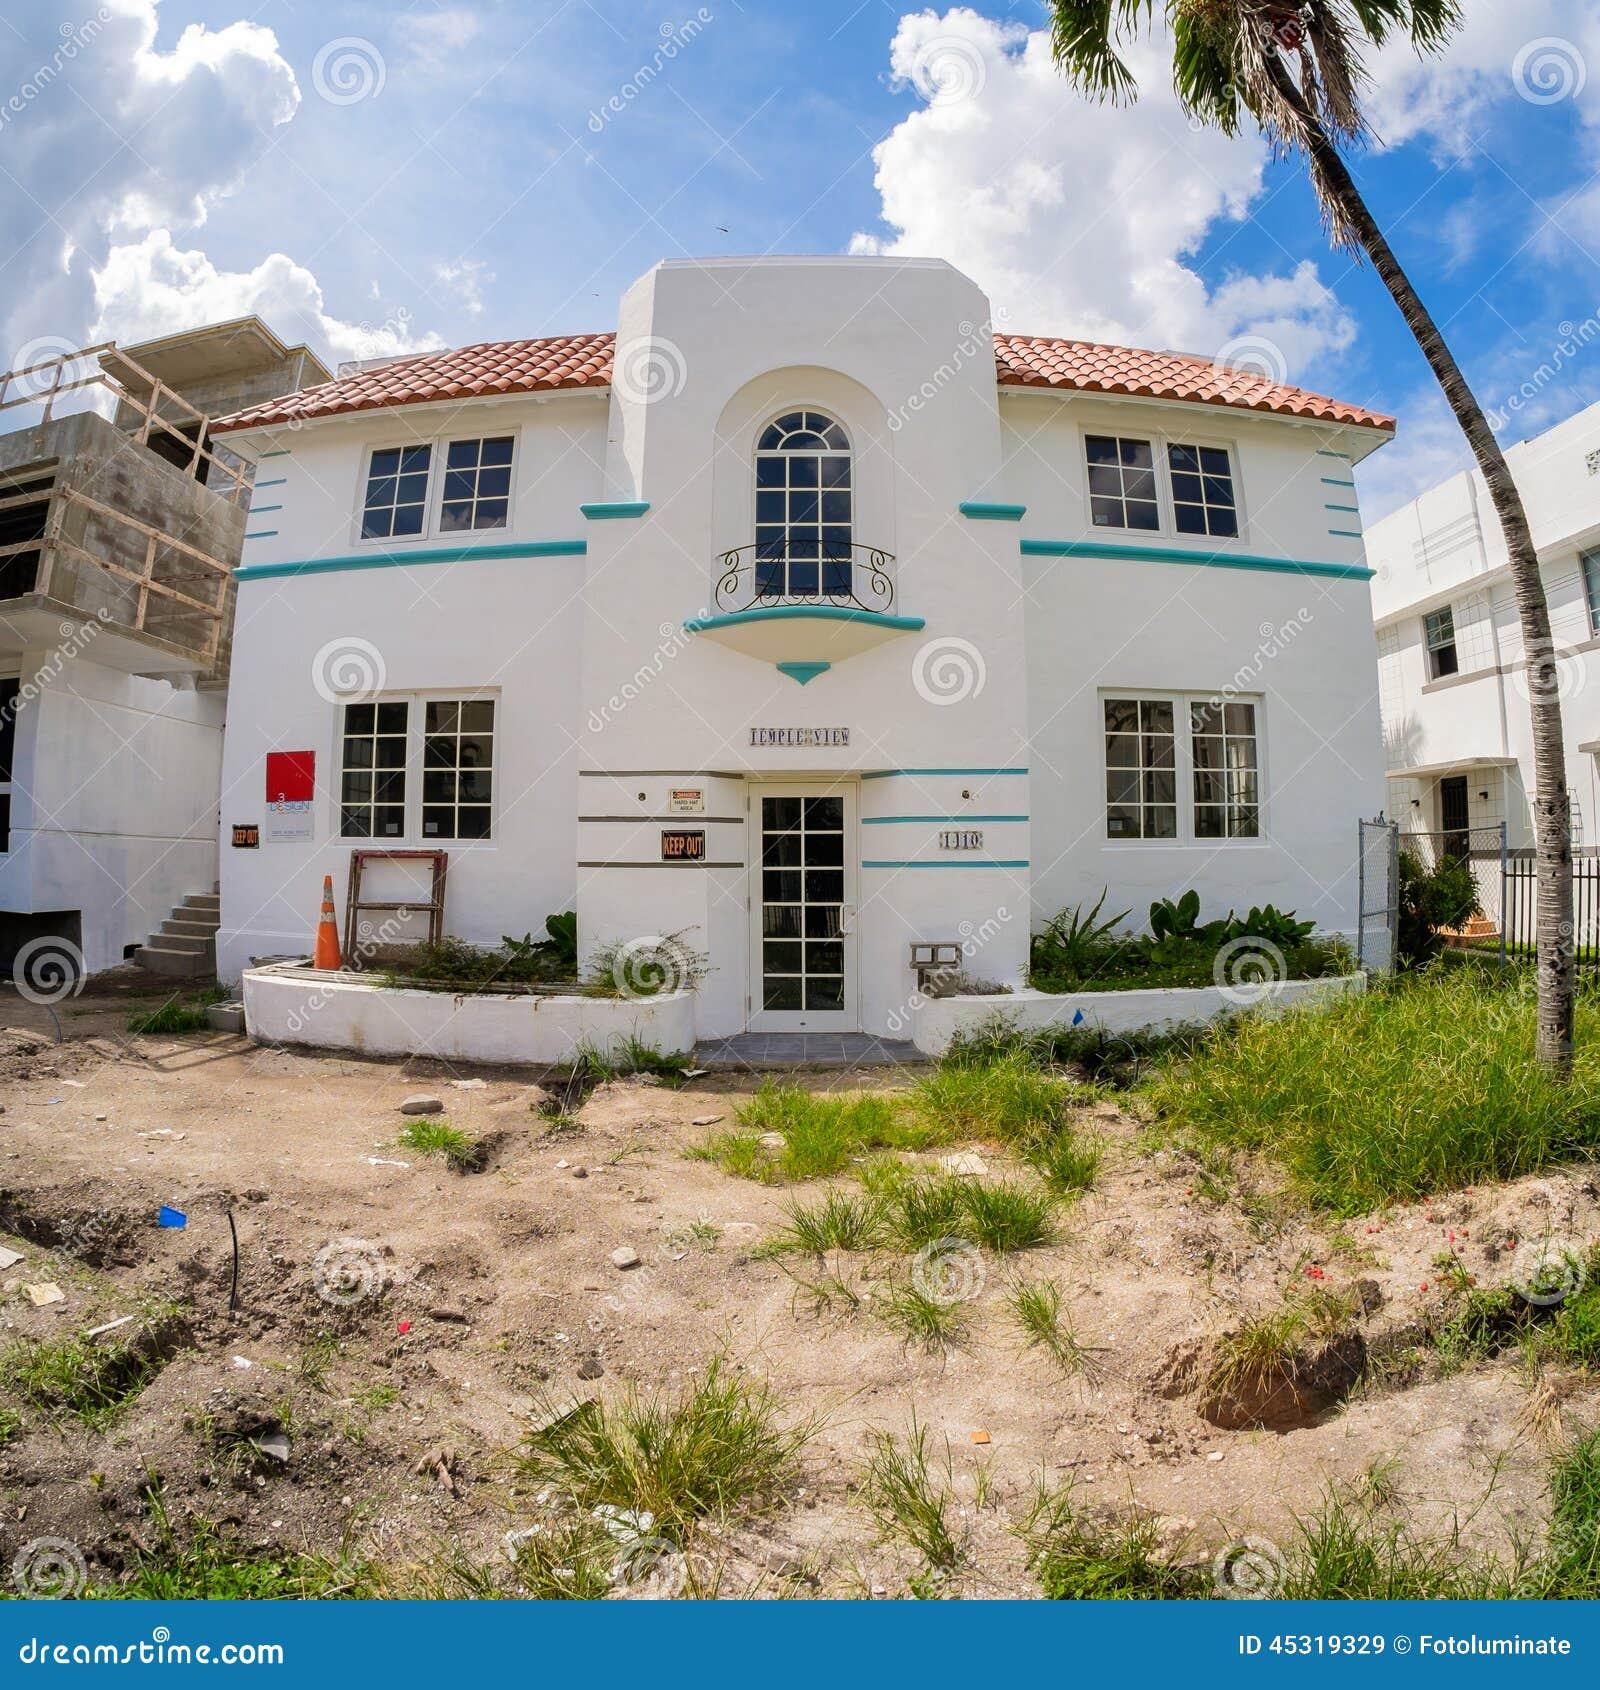 miami beach editorial stock image image of miami apartment 45319329. Black Bedroom Furniture Sets. Home Design Ideas